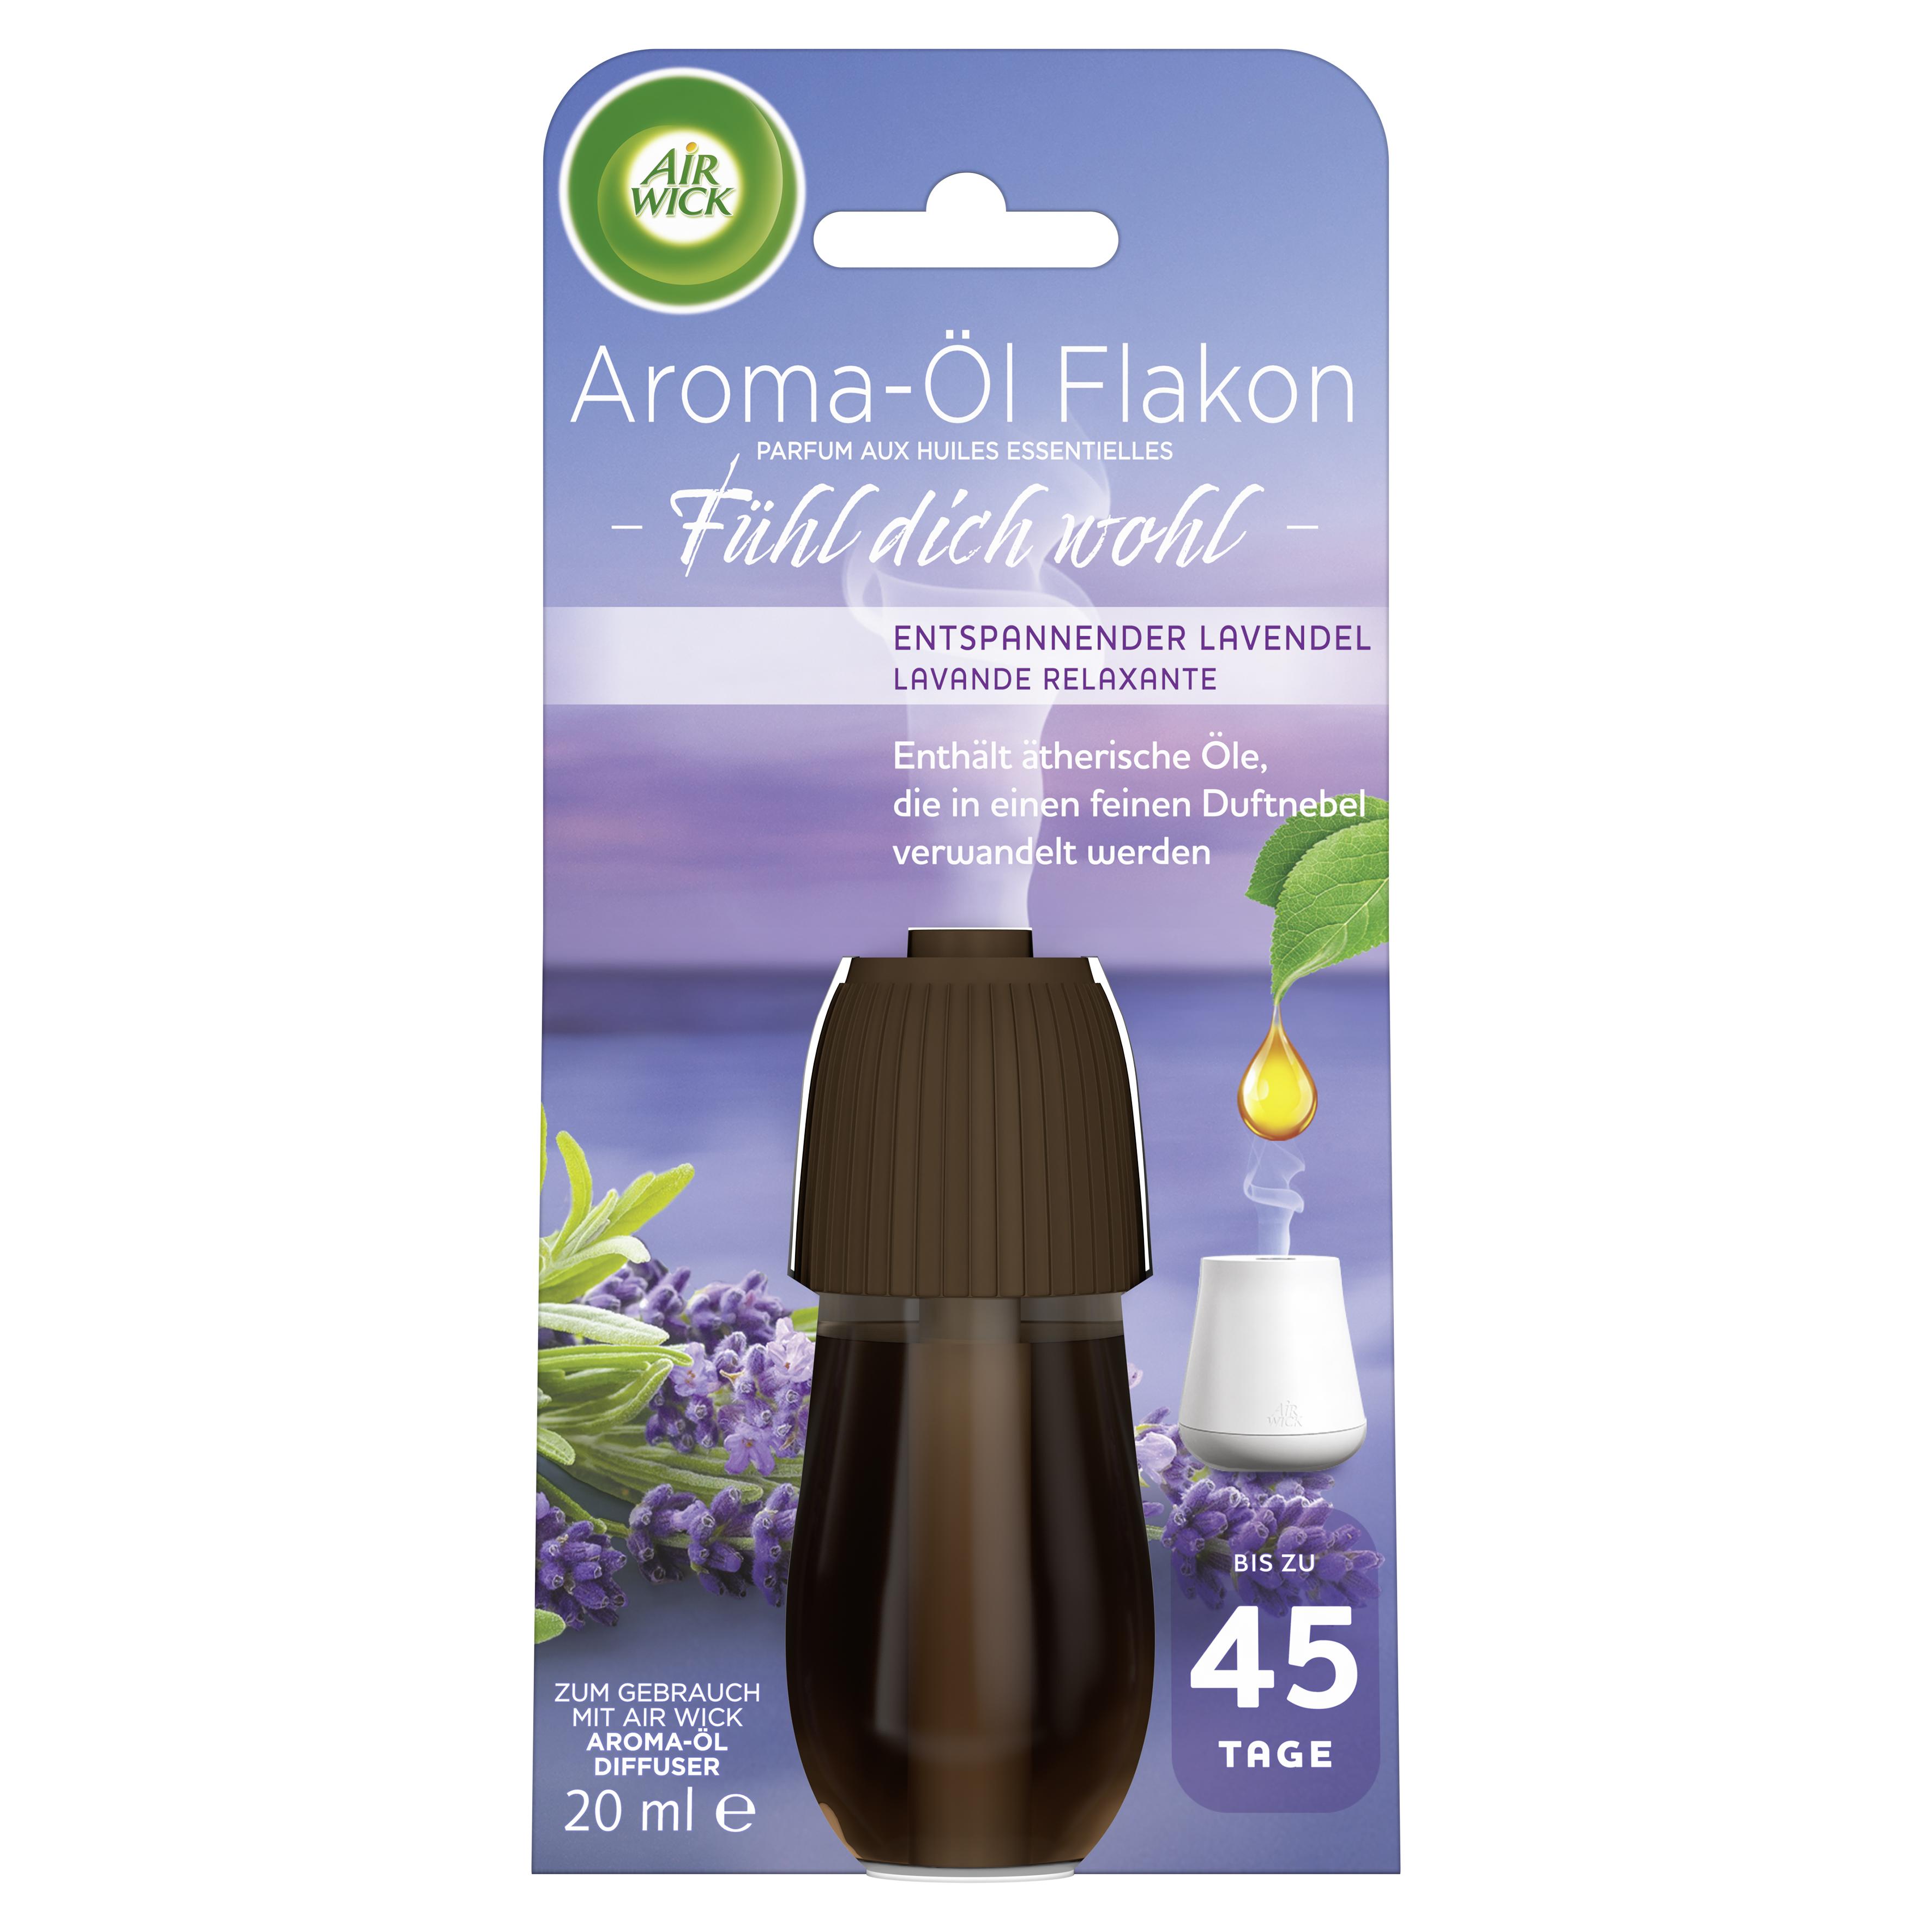 Air Wick Aroma-Öl Flakon Entspannender Lavendel